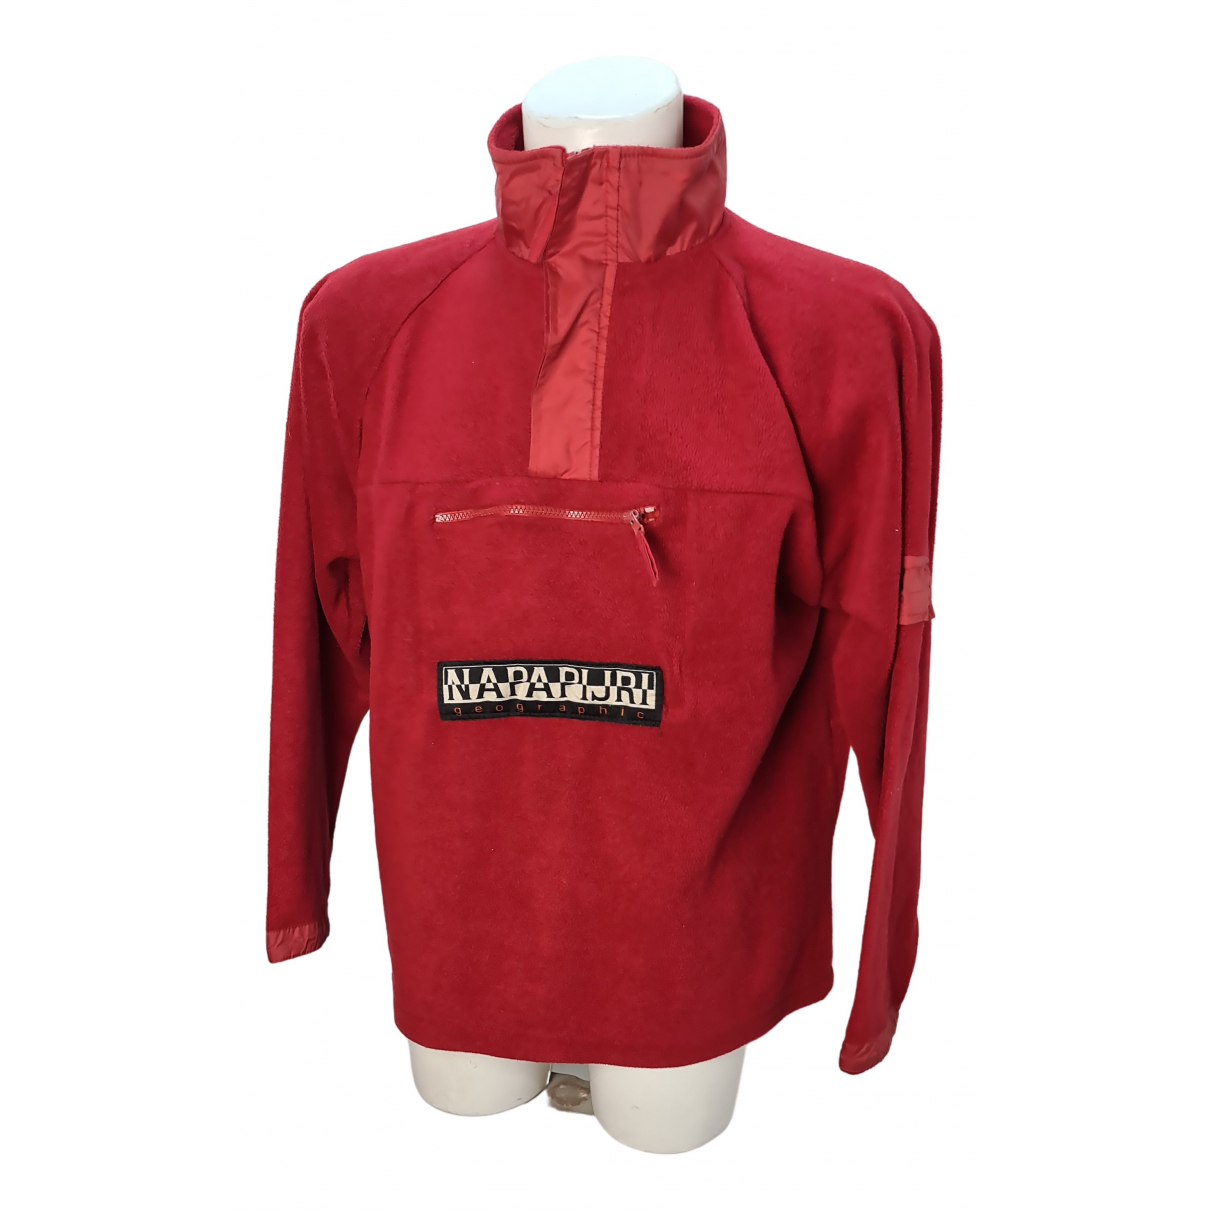 Napapijri \N Red Knitwear & Sweatshirts for Men L International